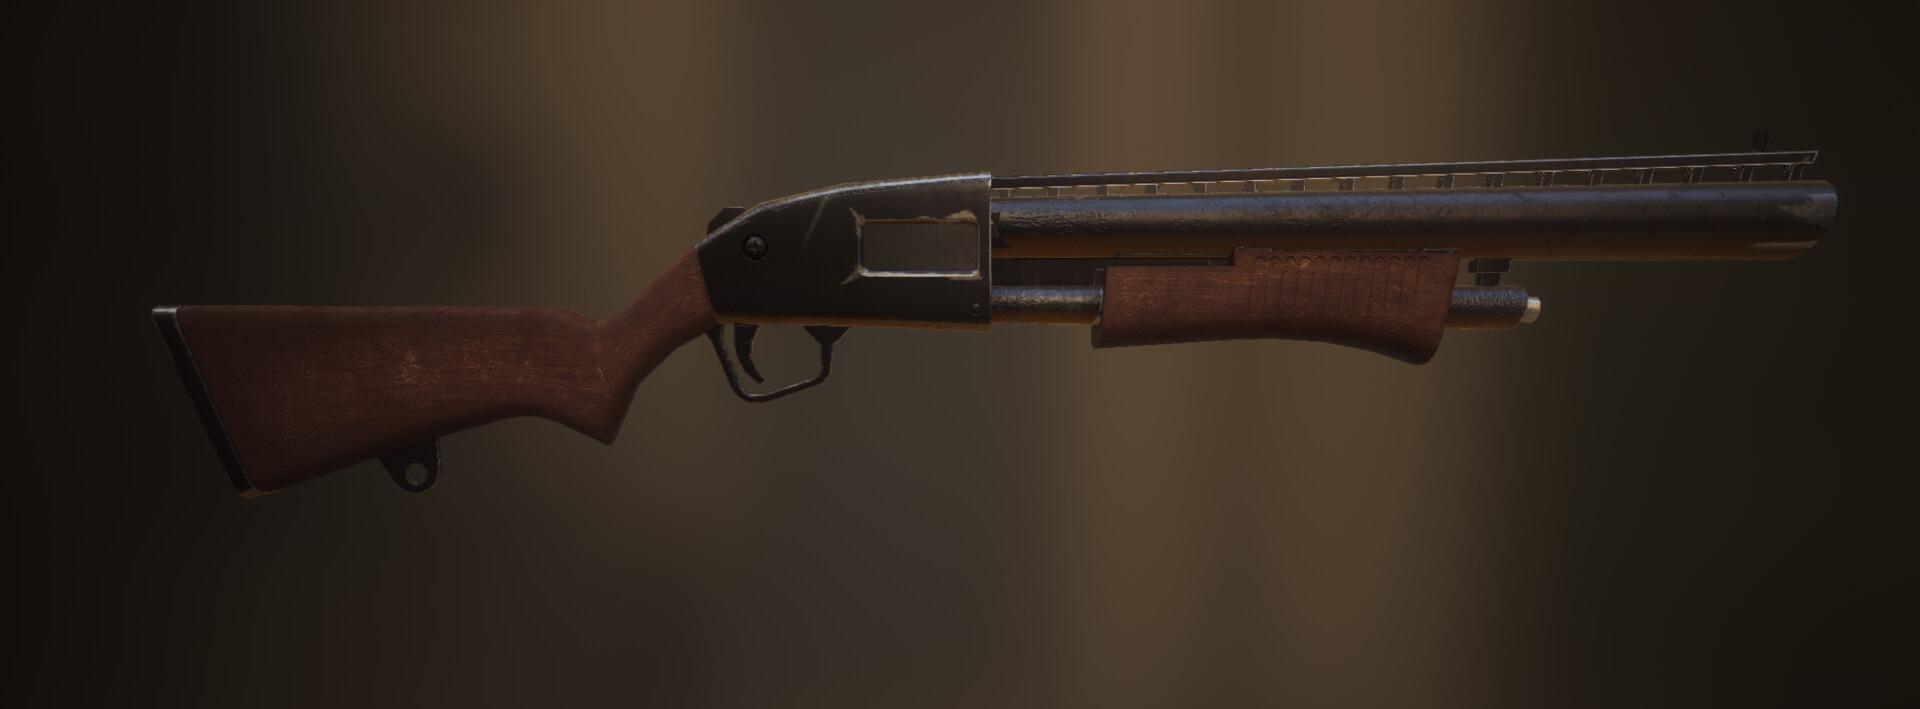 ArtStation - Fortnite Pump Shotgun, Tony Nguyen